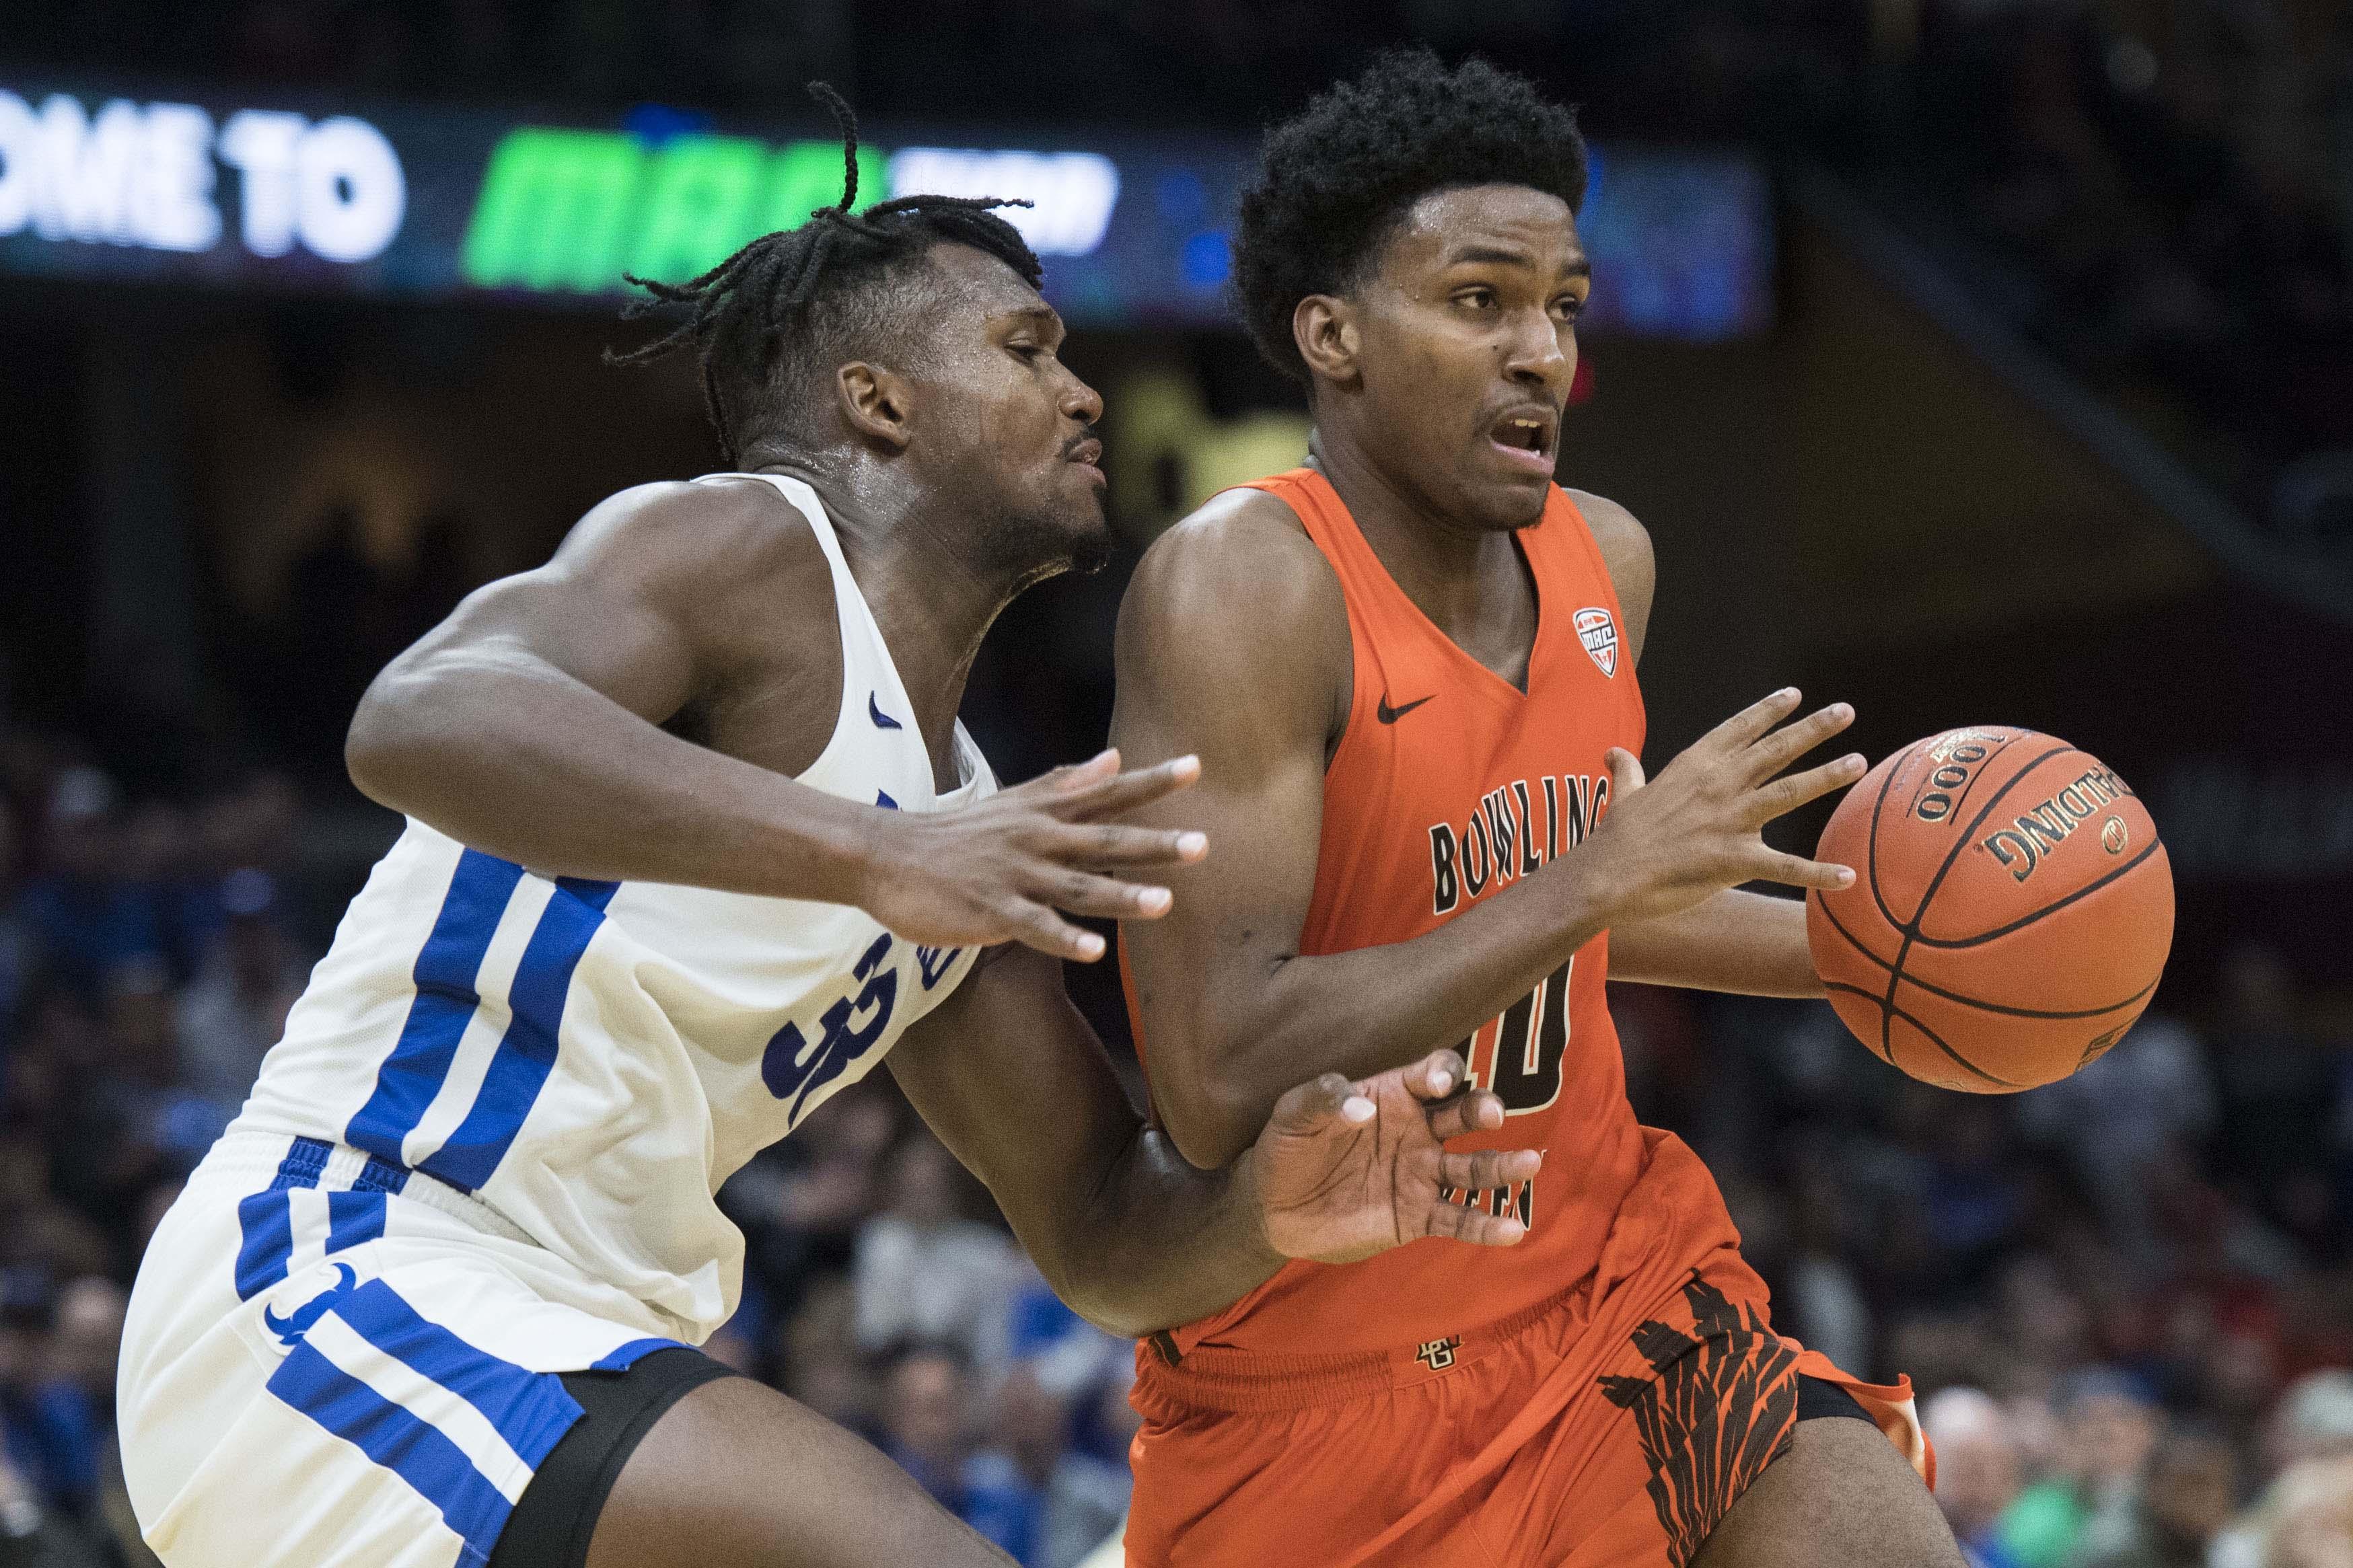 NCAA篮球:MAC会议锦标赛-布法罗对保龄球格林